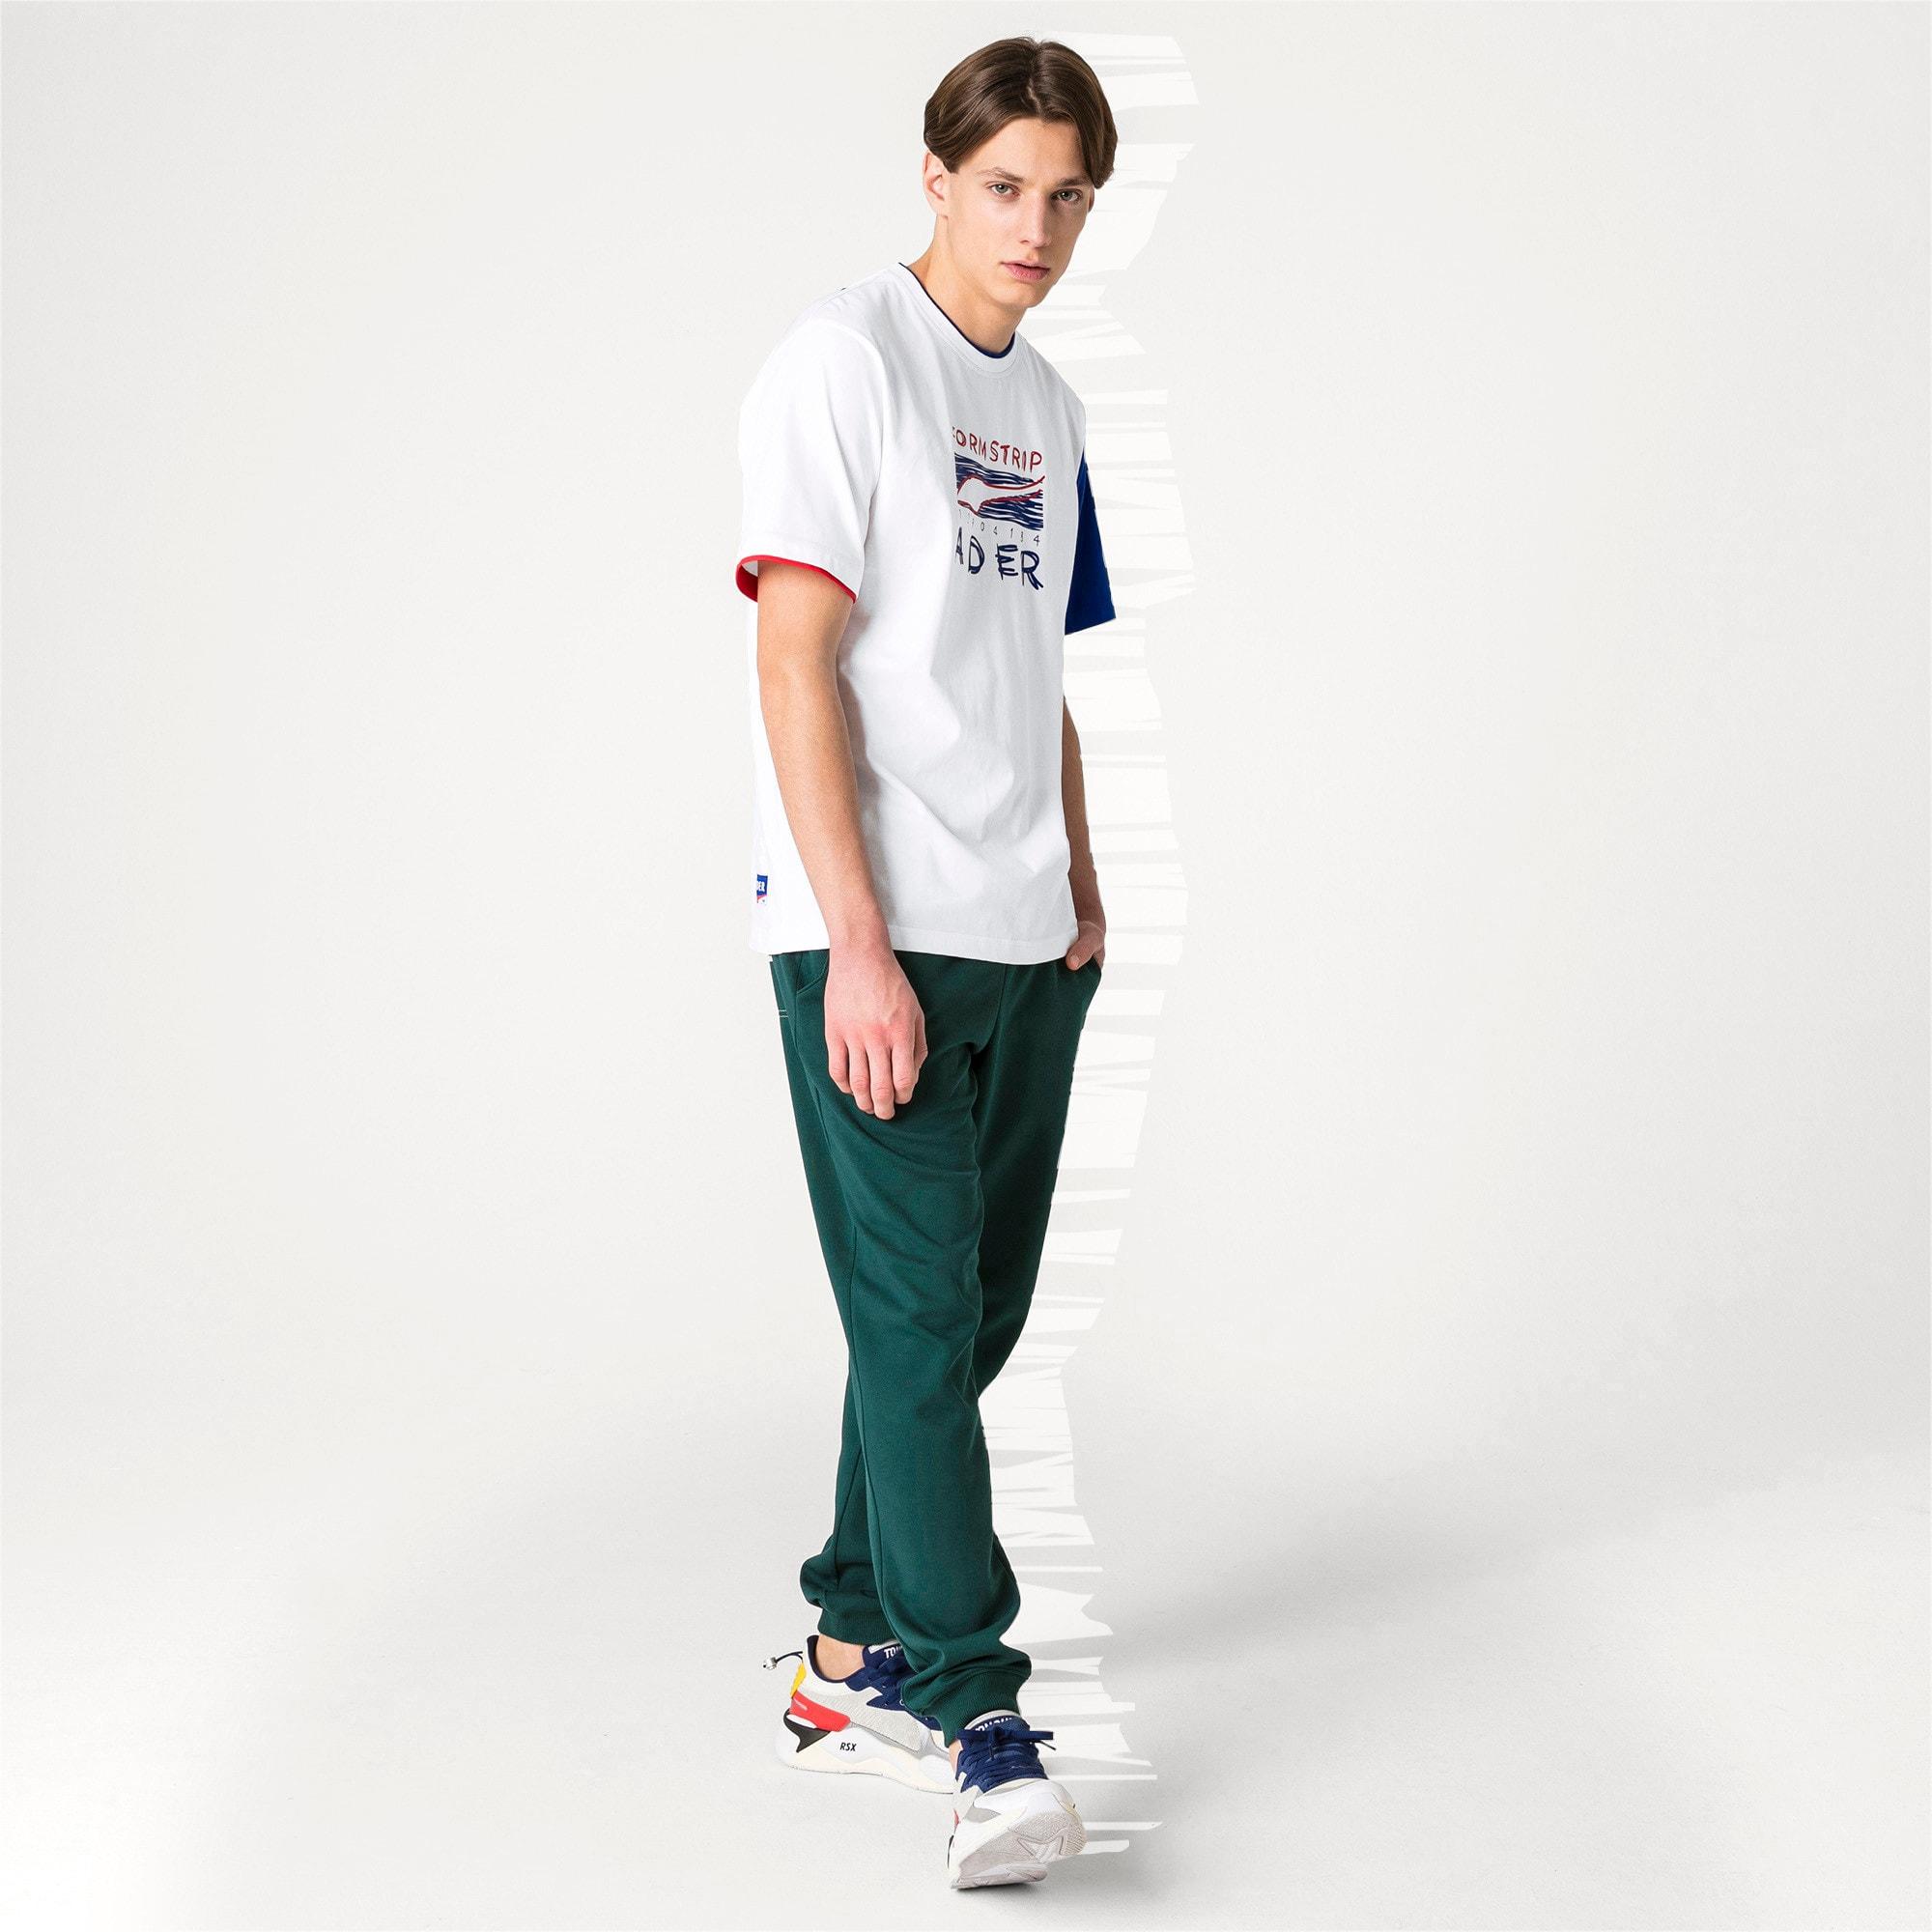 Thumbnail 5 of PUMA x ADER T-Shirt, Puma White, medium